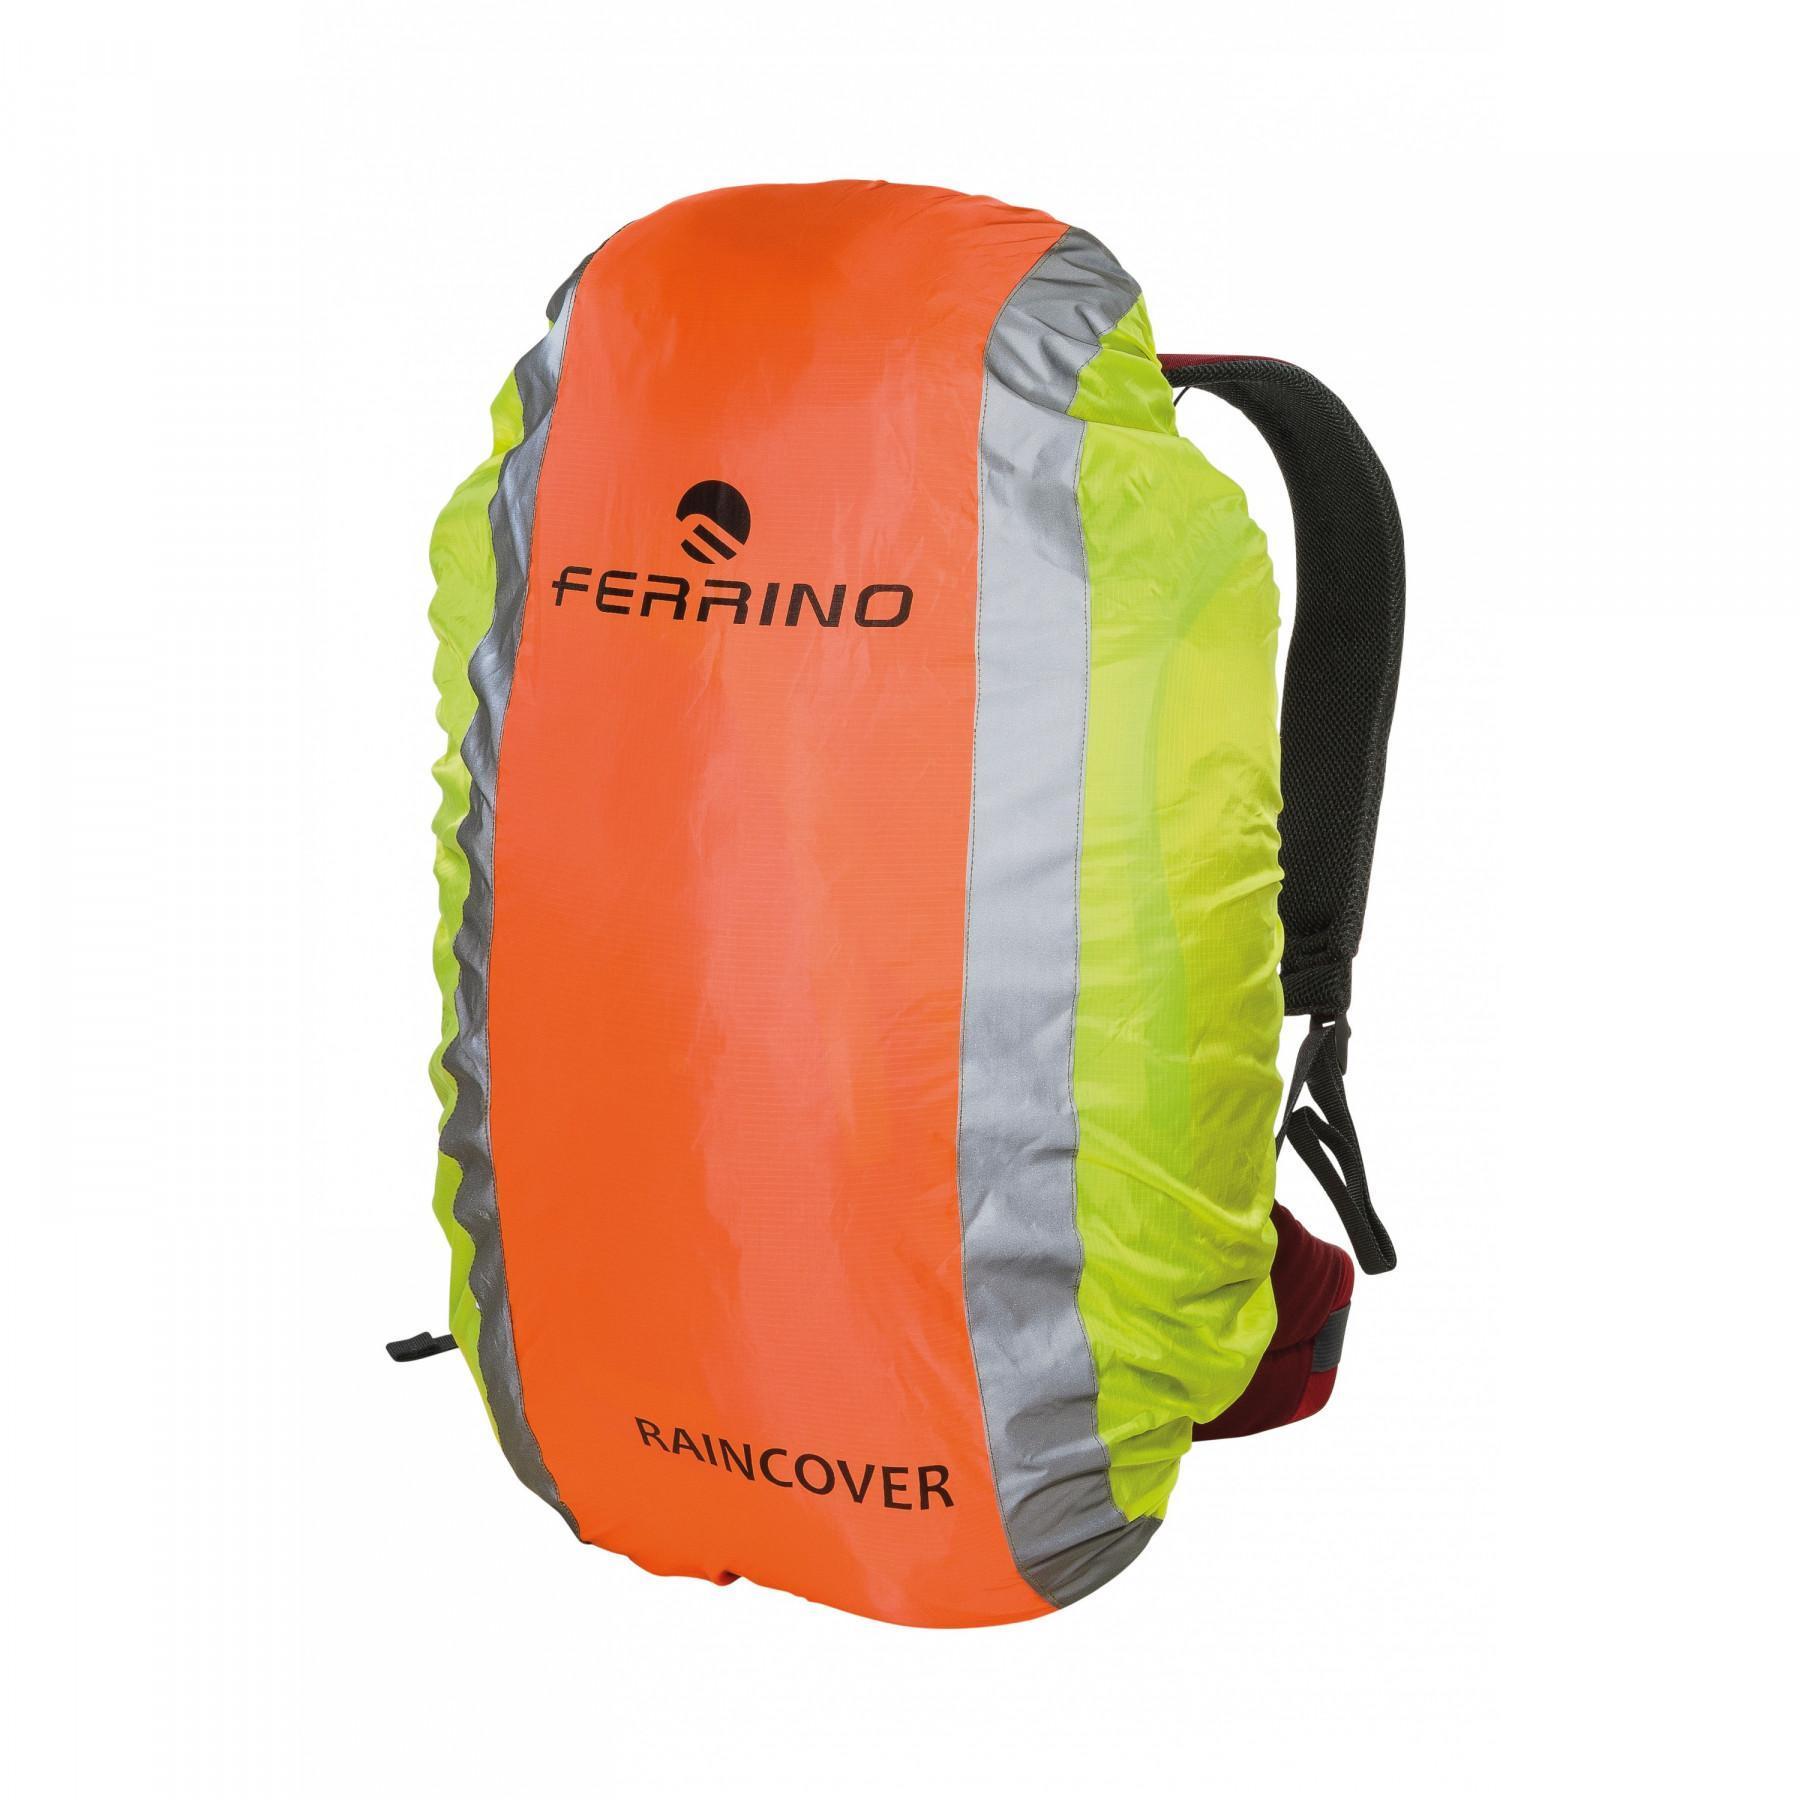 Sursac Ferrino cover 1 reflex